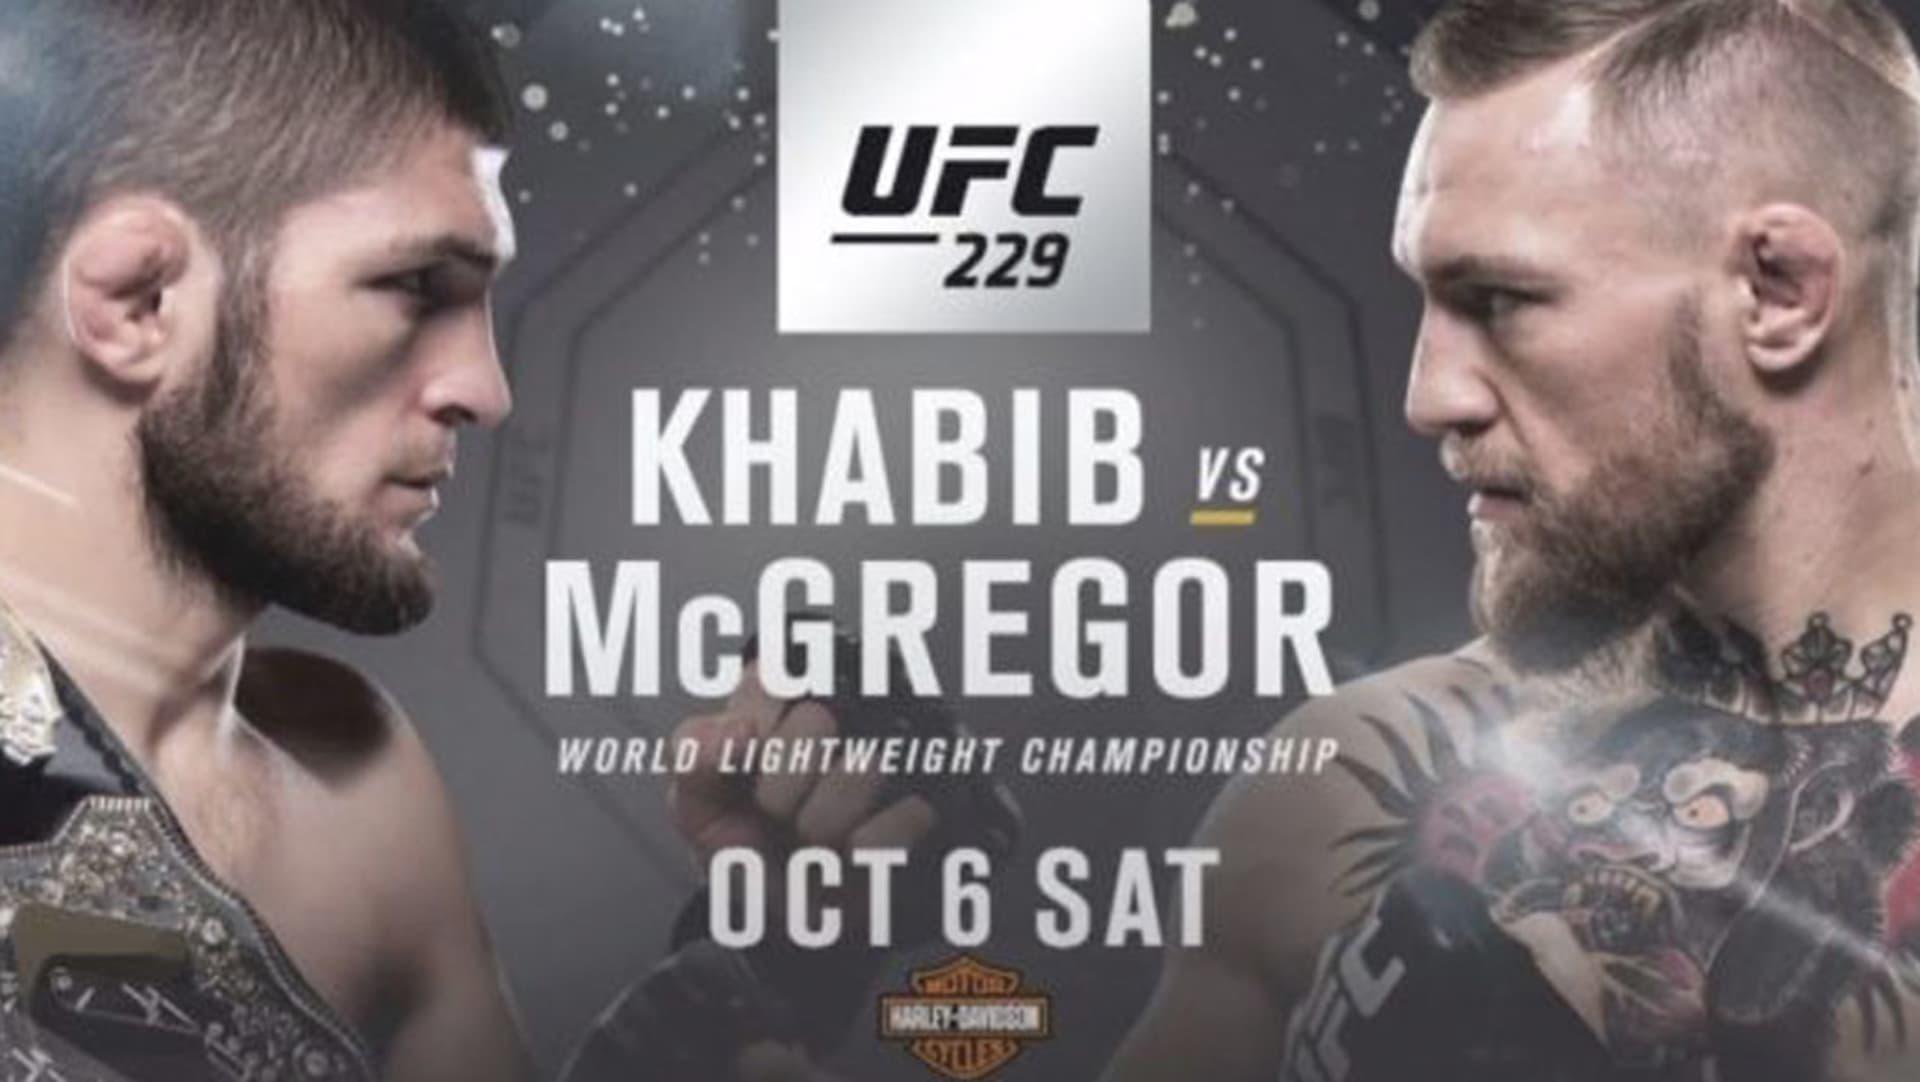 UFC 229 Lightweight Title Fight Conor McGregor vs Khabib Nurmagomedov